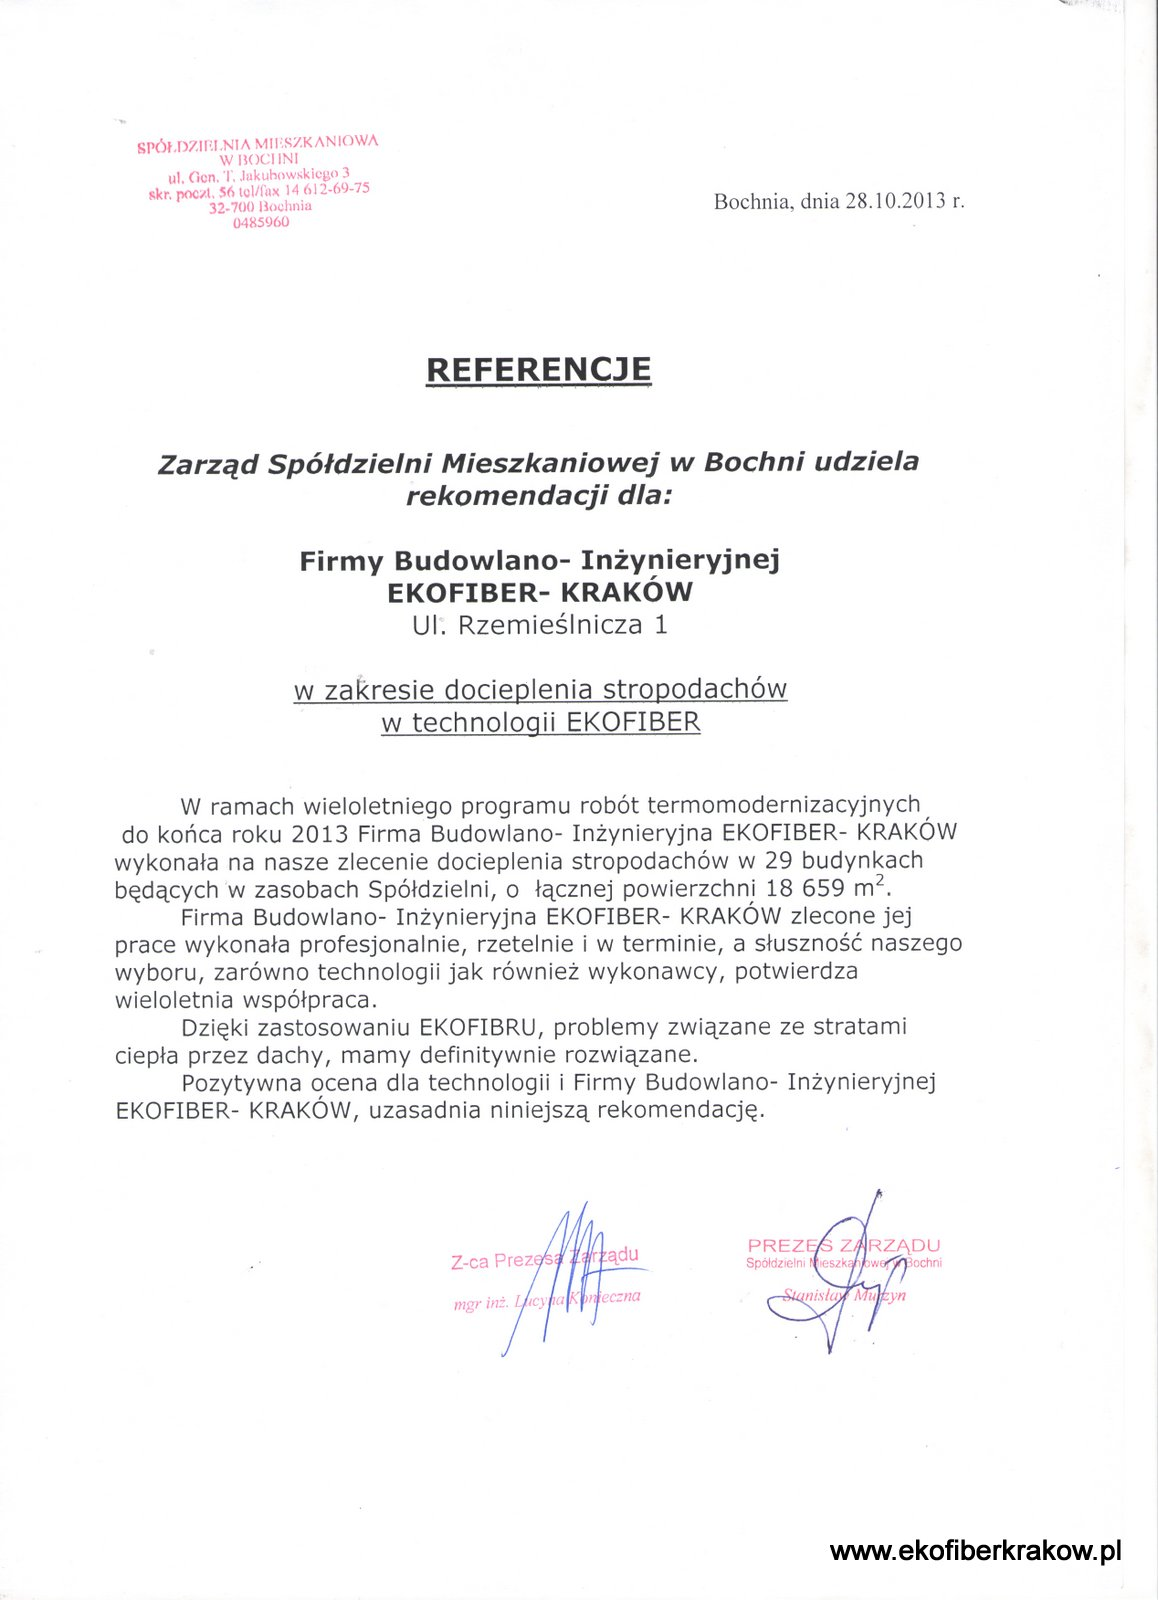 Referencje SM w Bochni